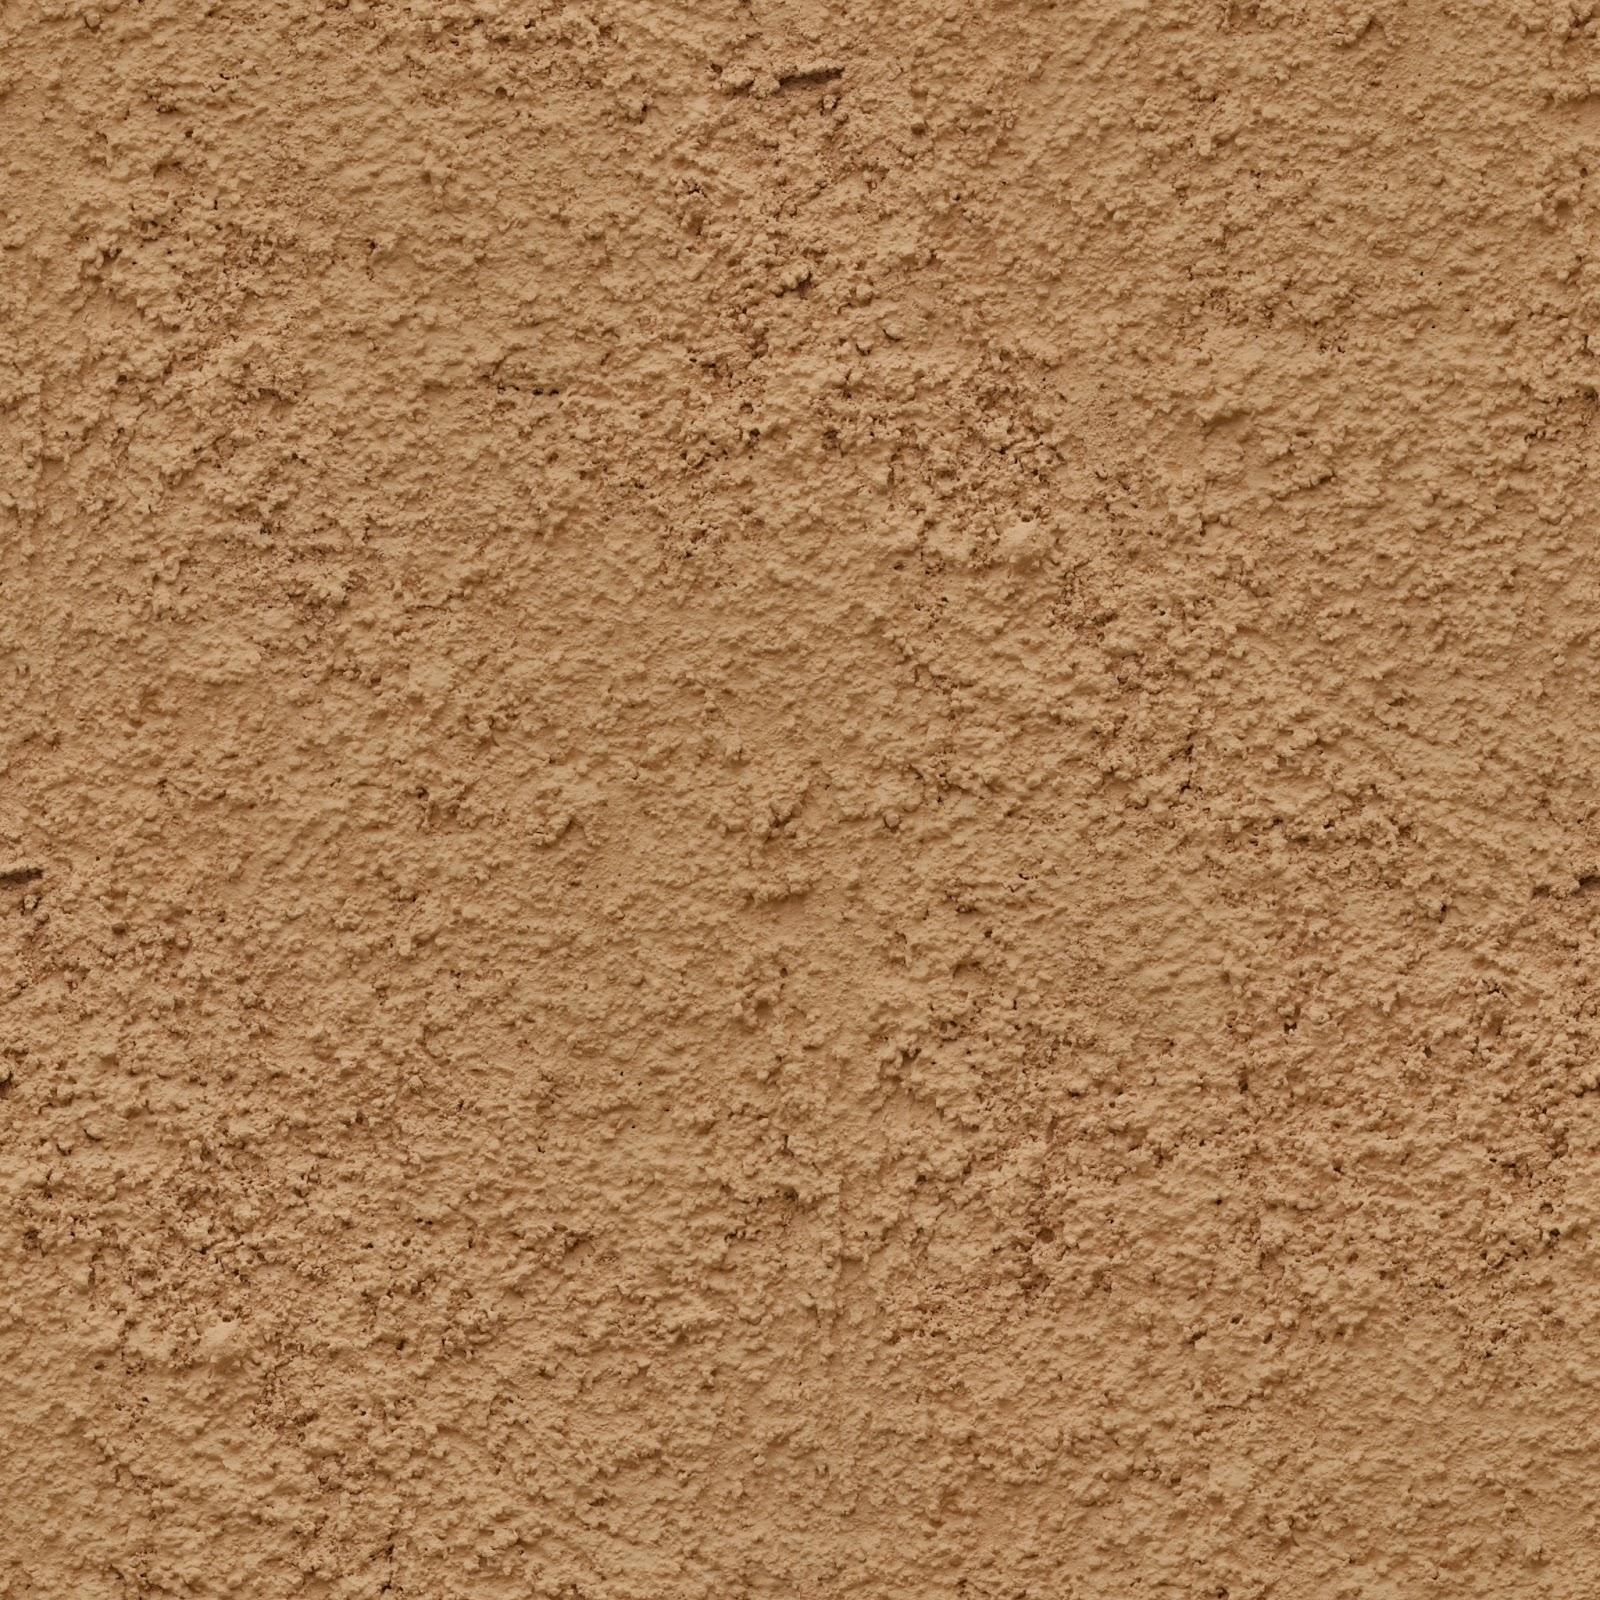 Bowl Games 2017 >> High Resolution Seamless Textures: Rough Stucco texture